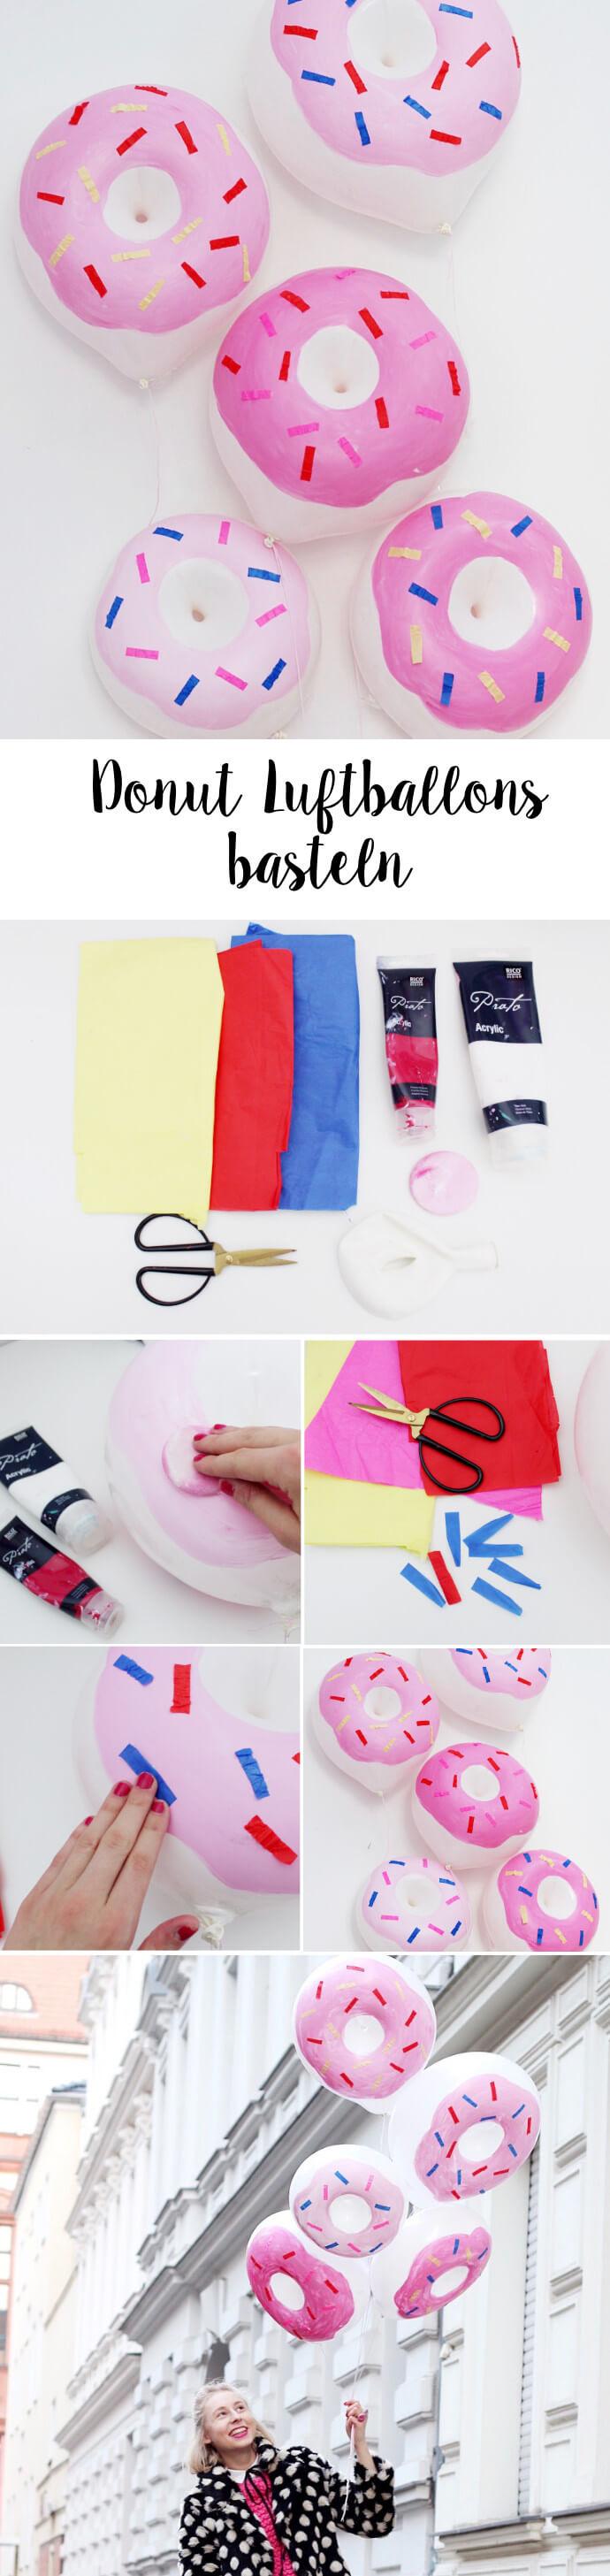 DIY-Party-Deko-Luftballons-selber-machen-basteln-DIY-Blog